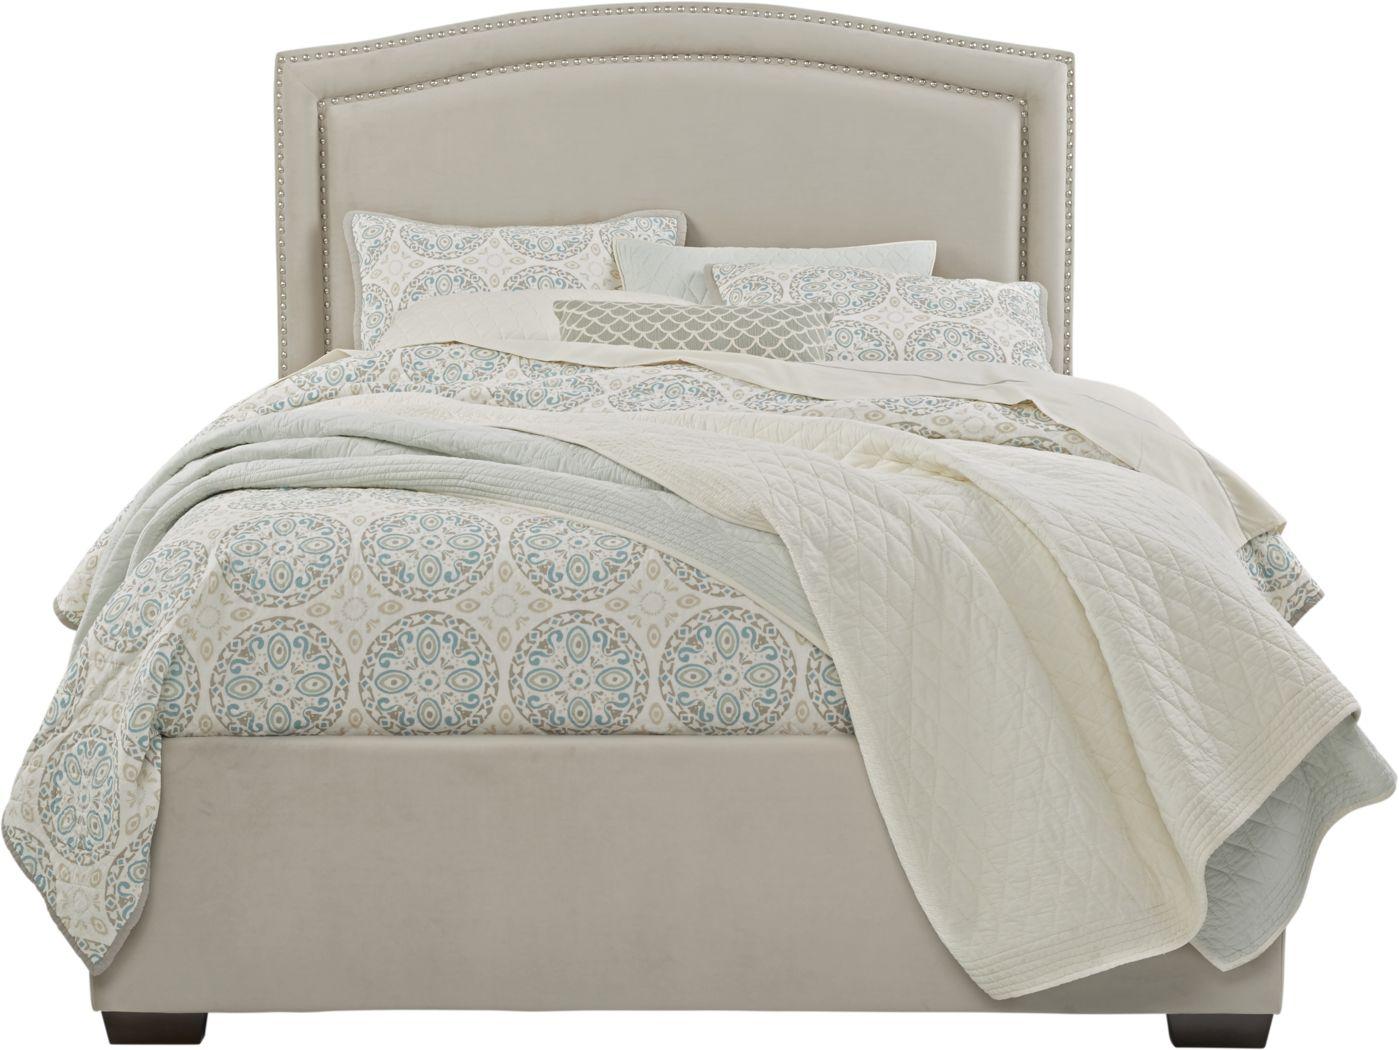 Loden Beige 3 Pc Queen Upholstered Bed